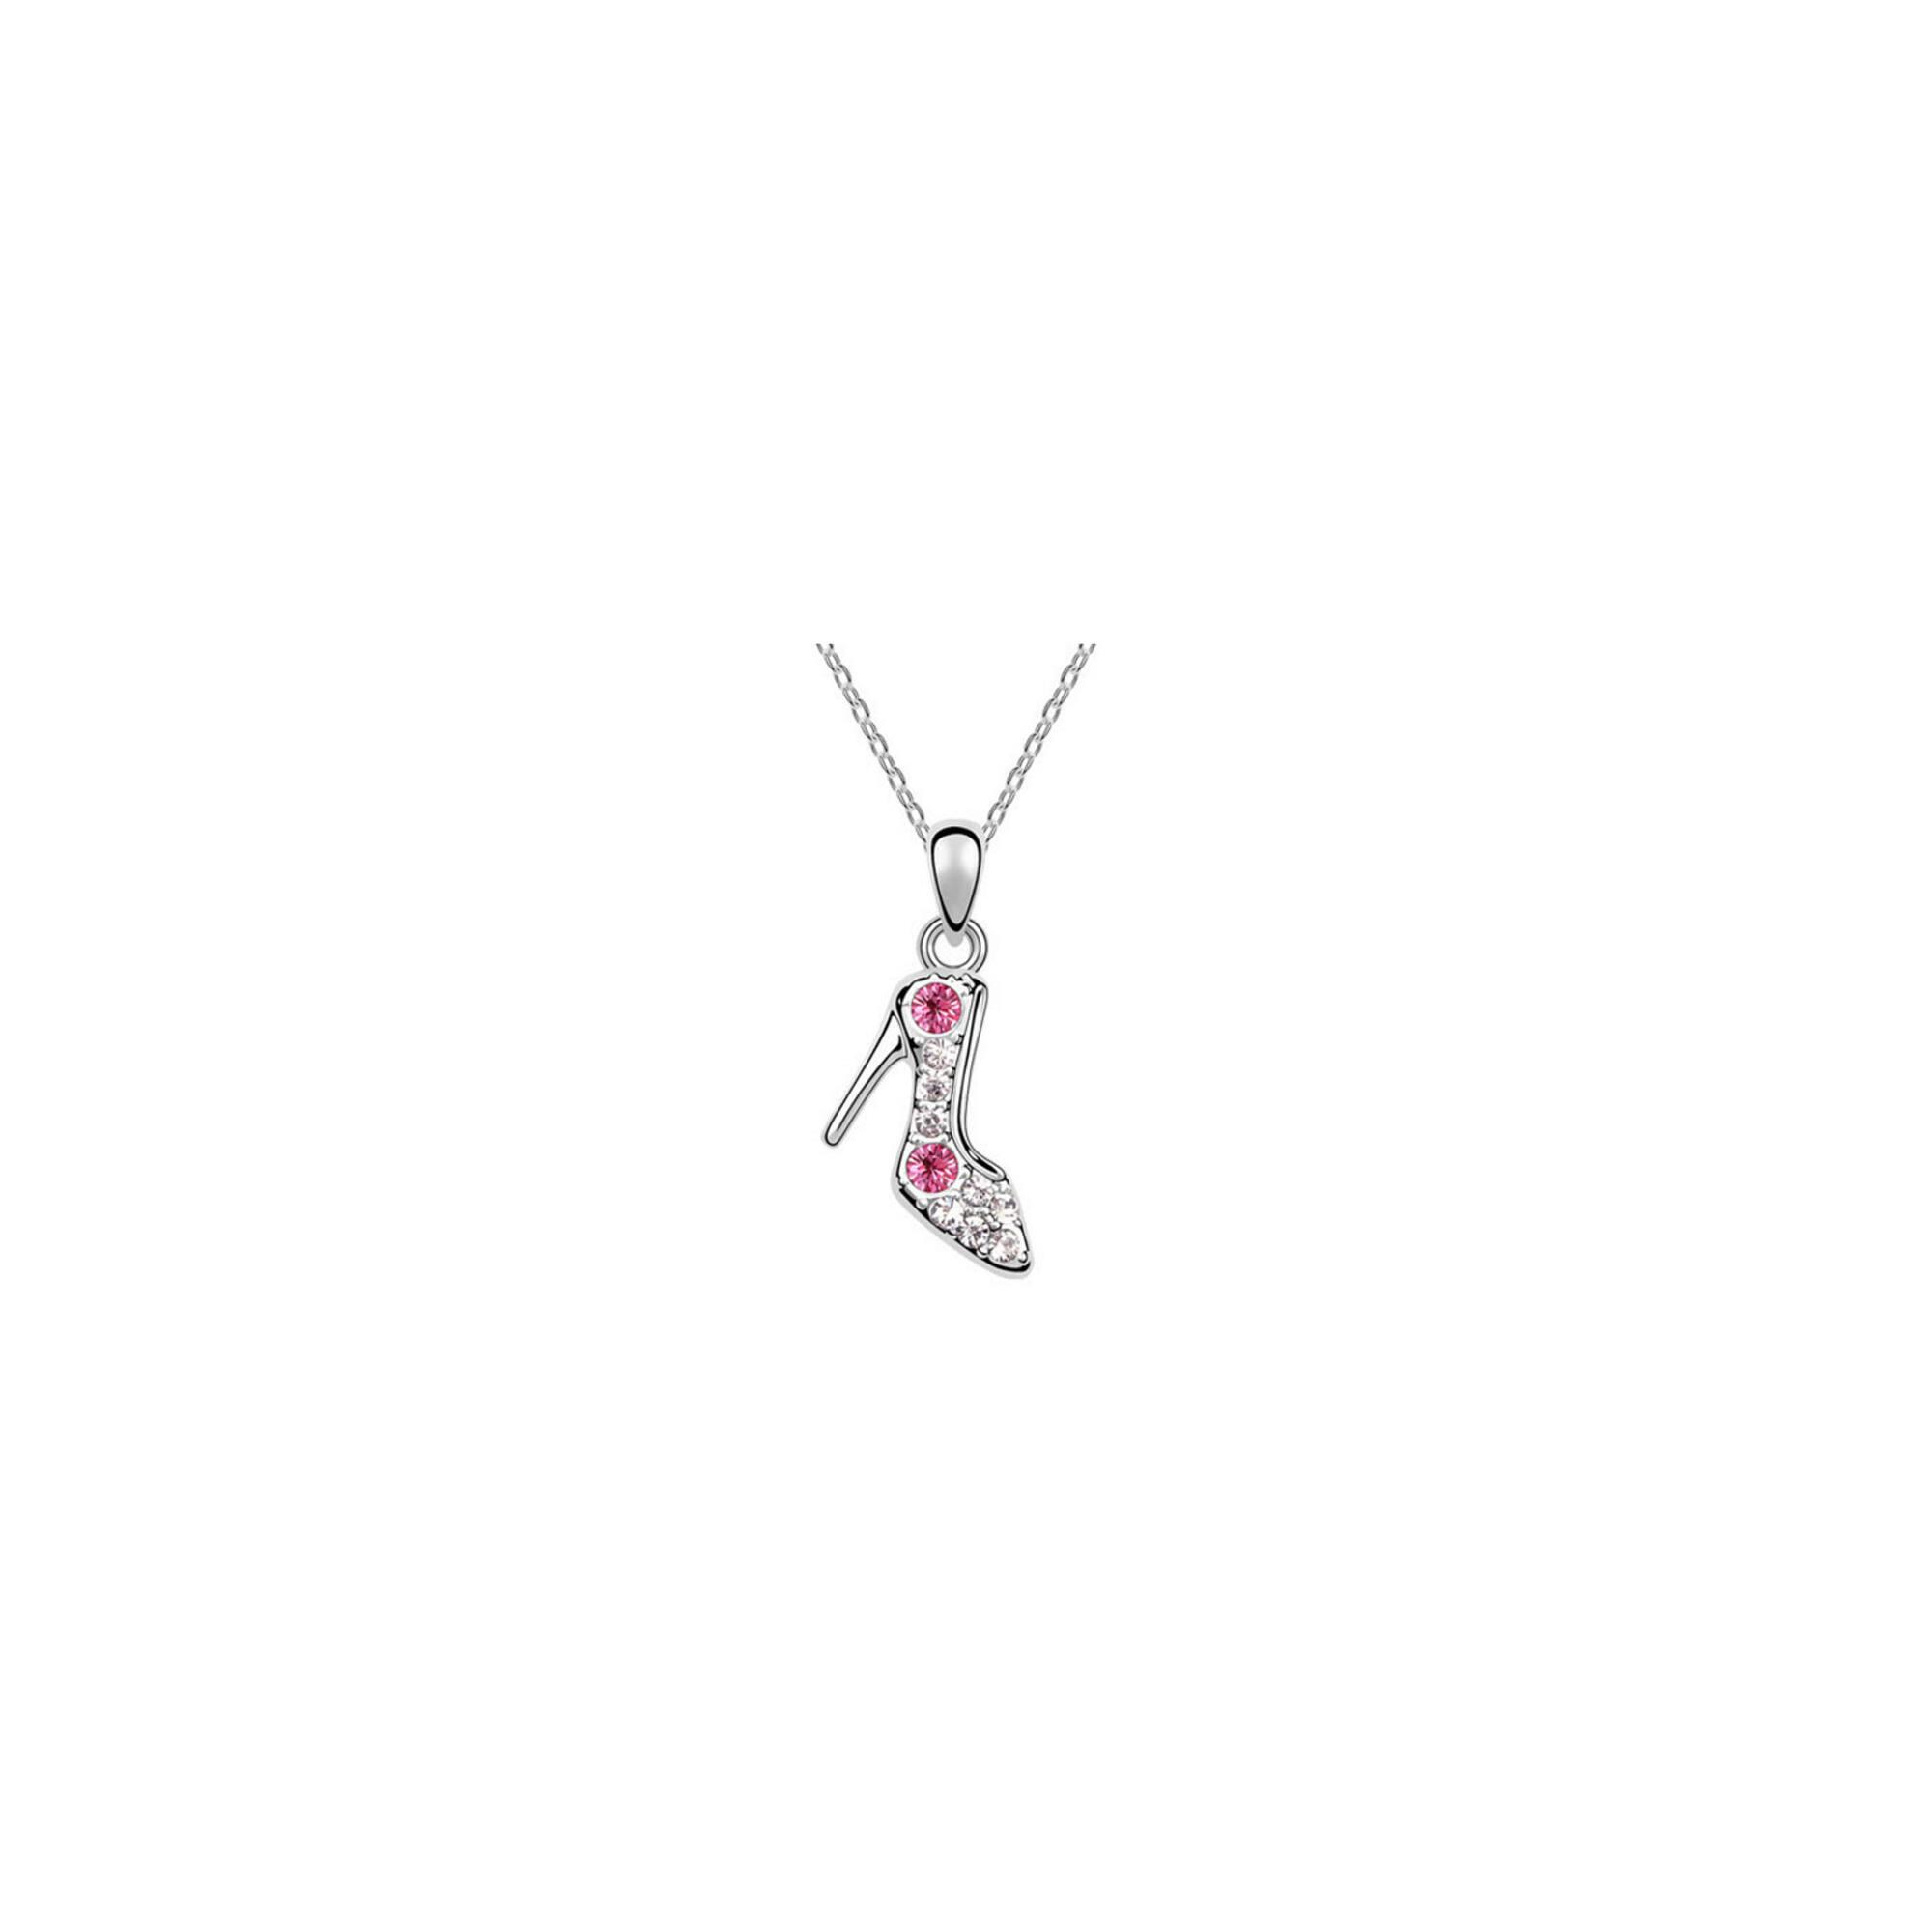 Cipellő Swarovski kristályos medál nyaklánccal